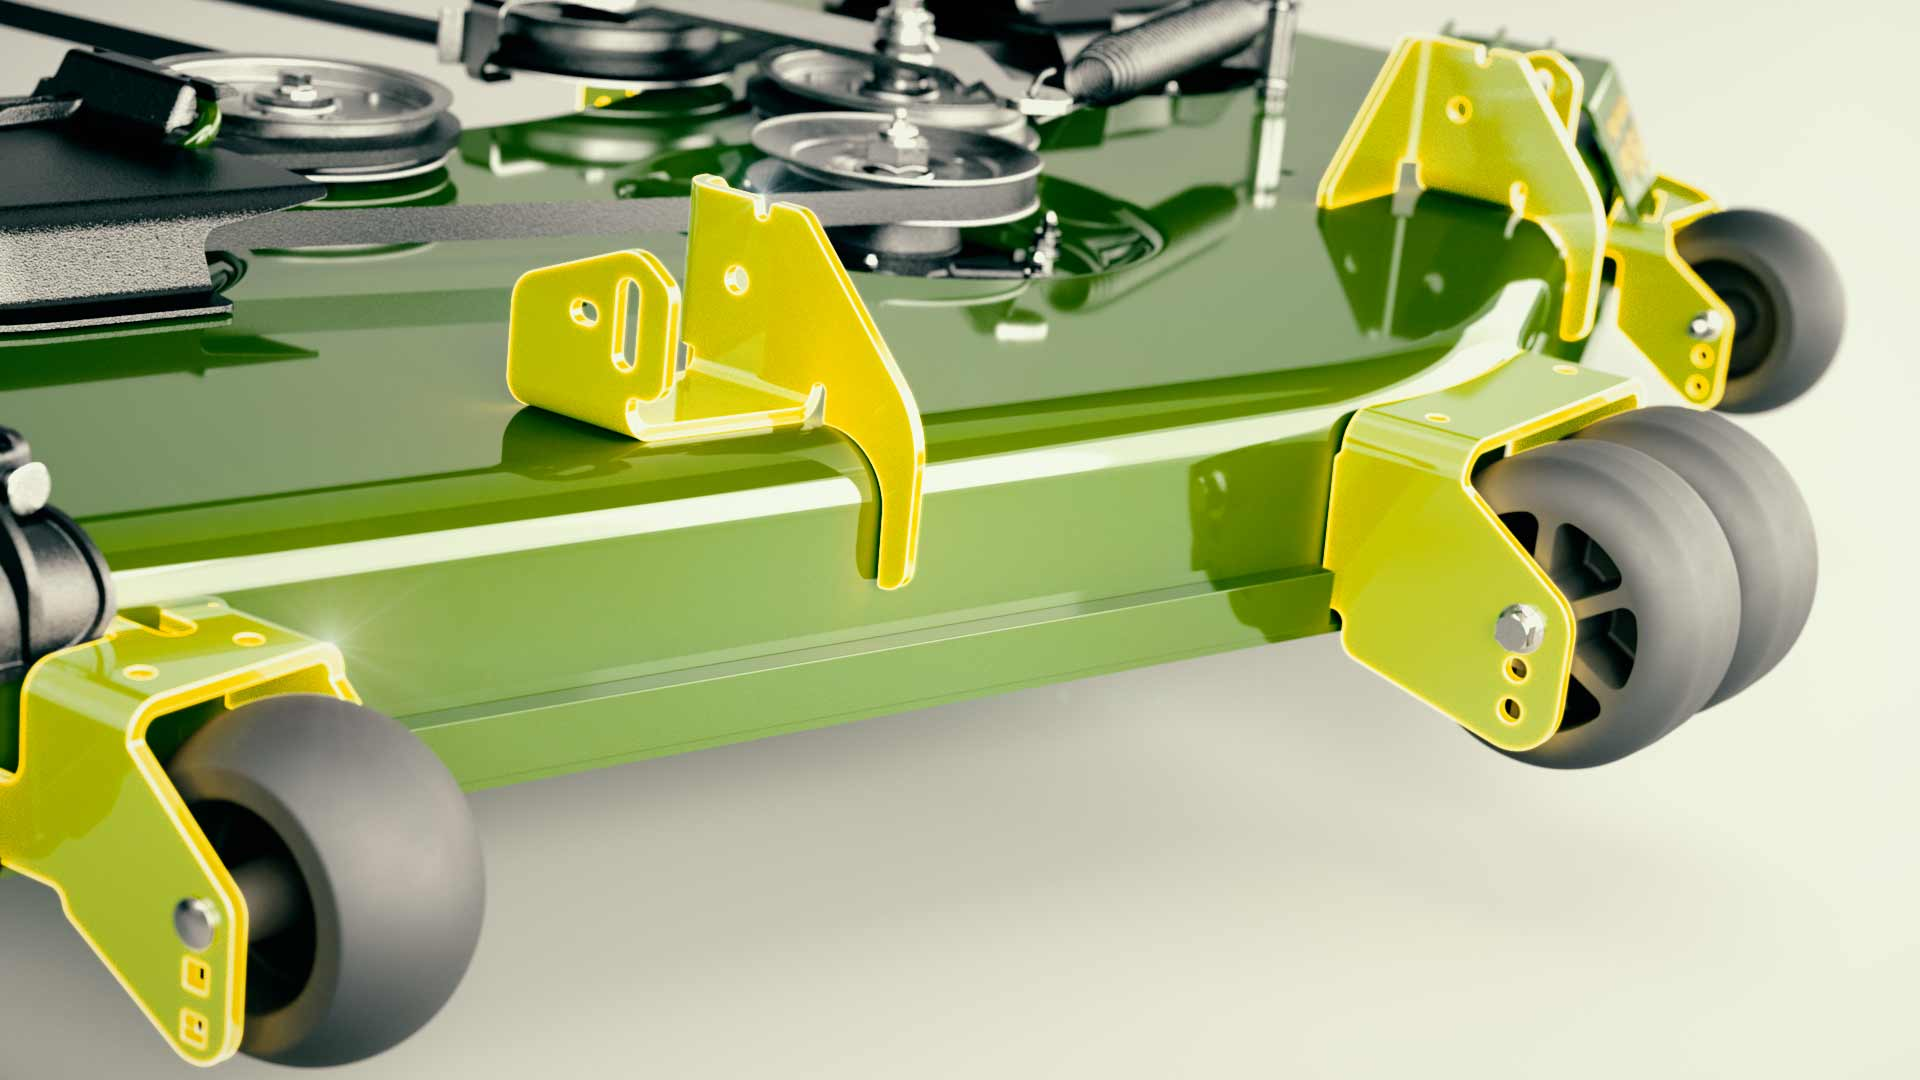 Close view of wheel brackets on green John Deere mower deck